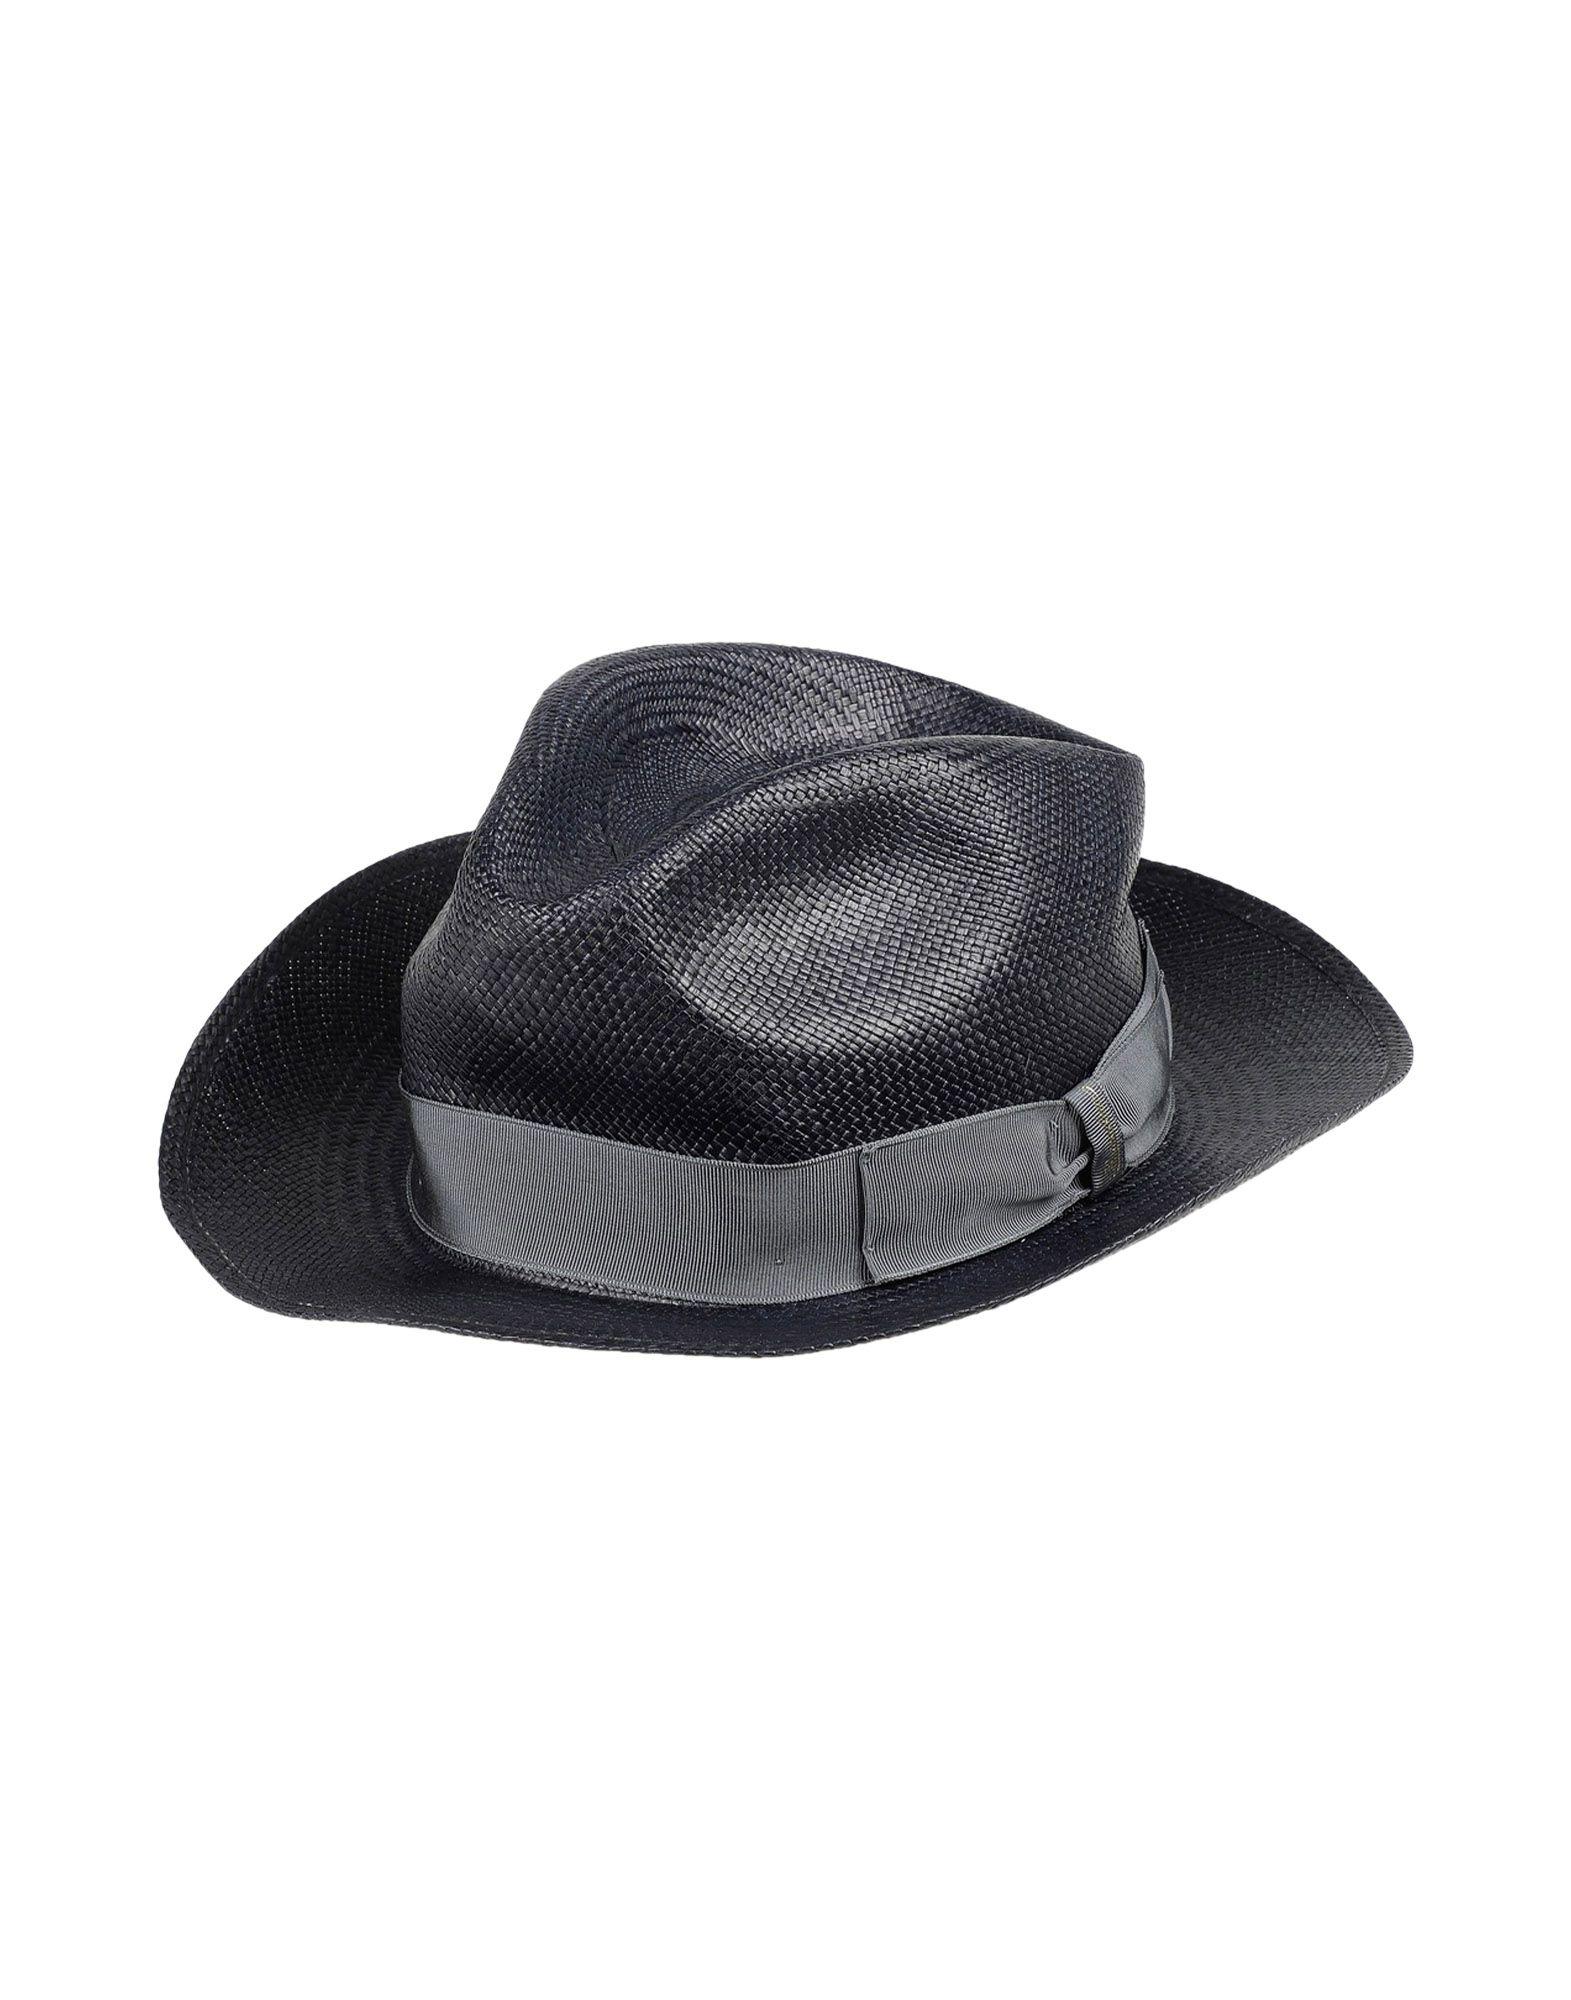 d399ace4b8c5b Buy borsalino hats for men - Best men s borsalino hats shop - Cools.com